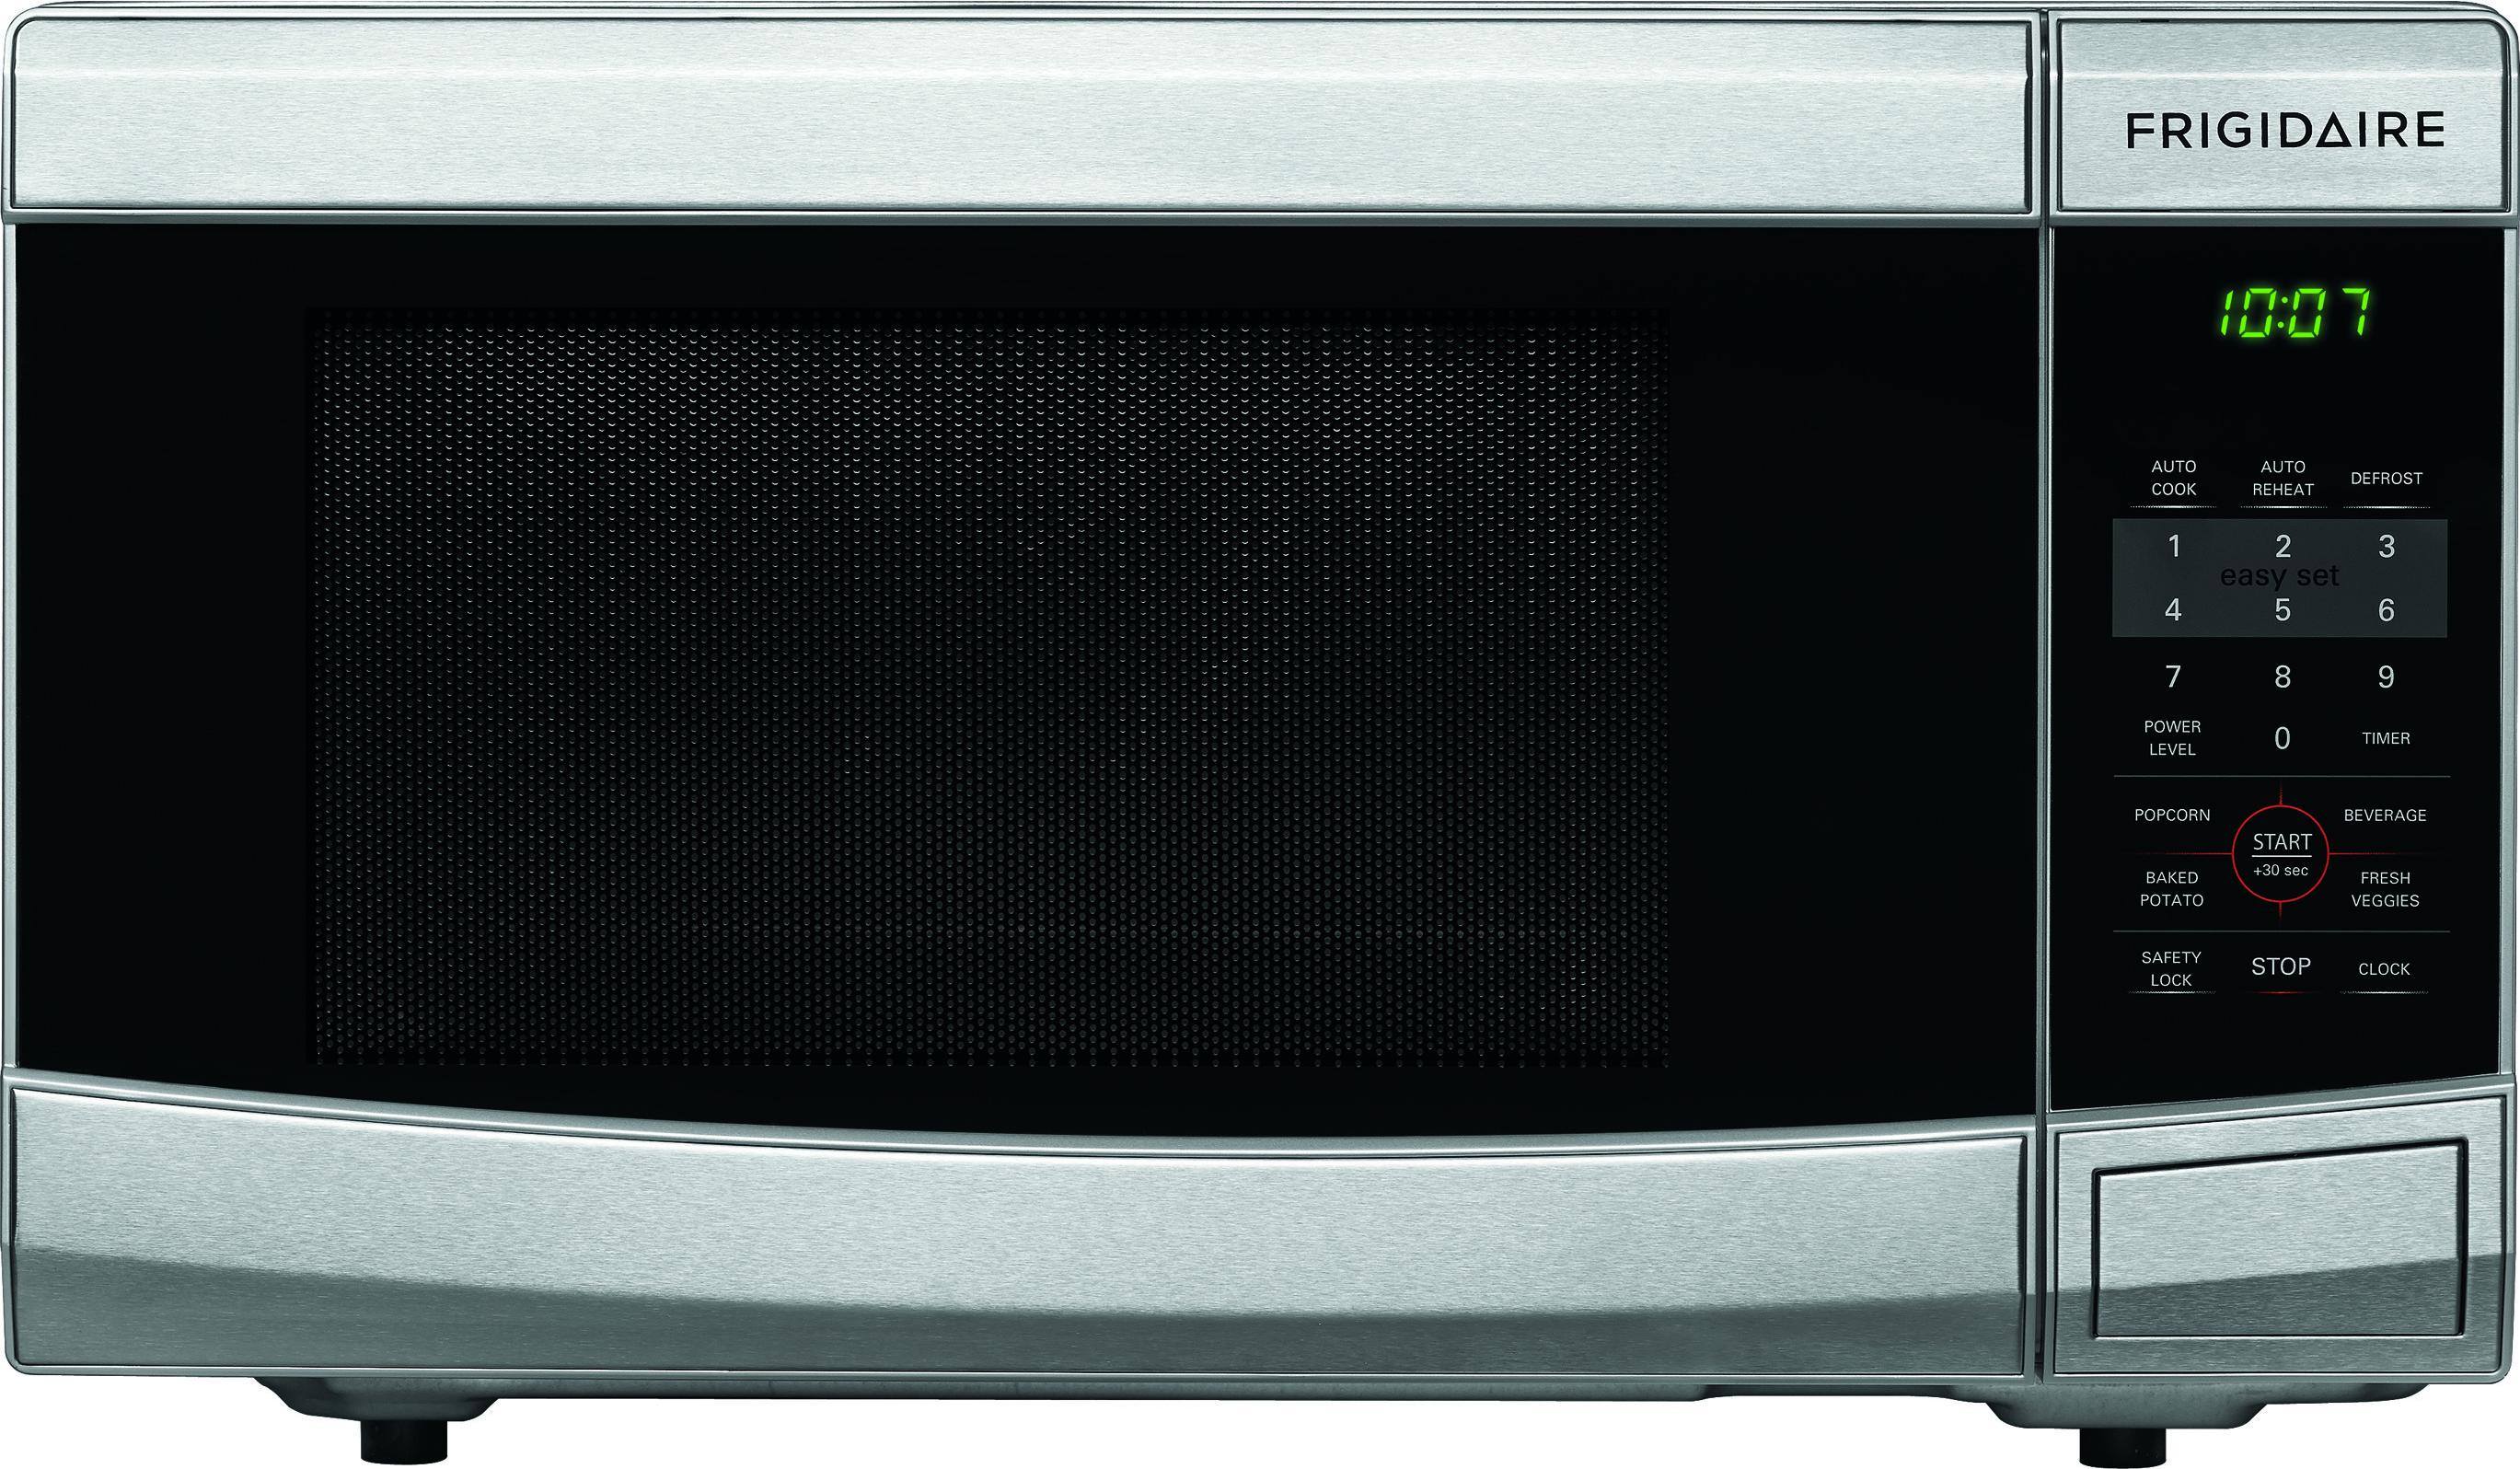 1.1 Cu. Ft. Countertop Microwave